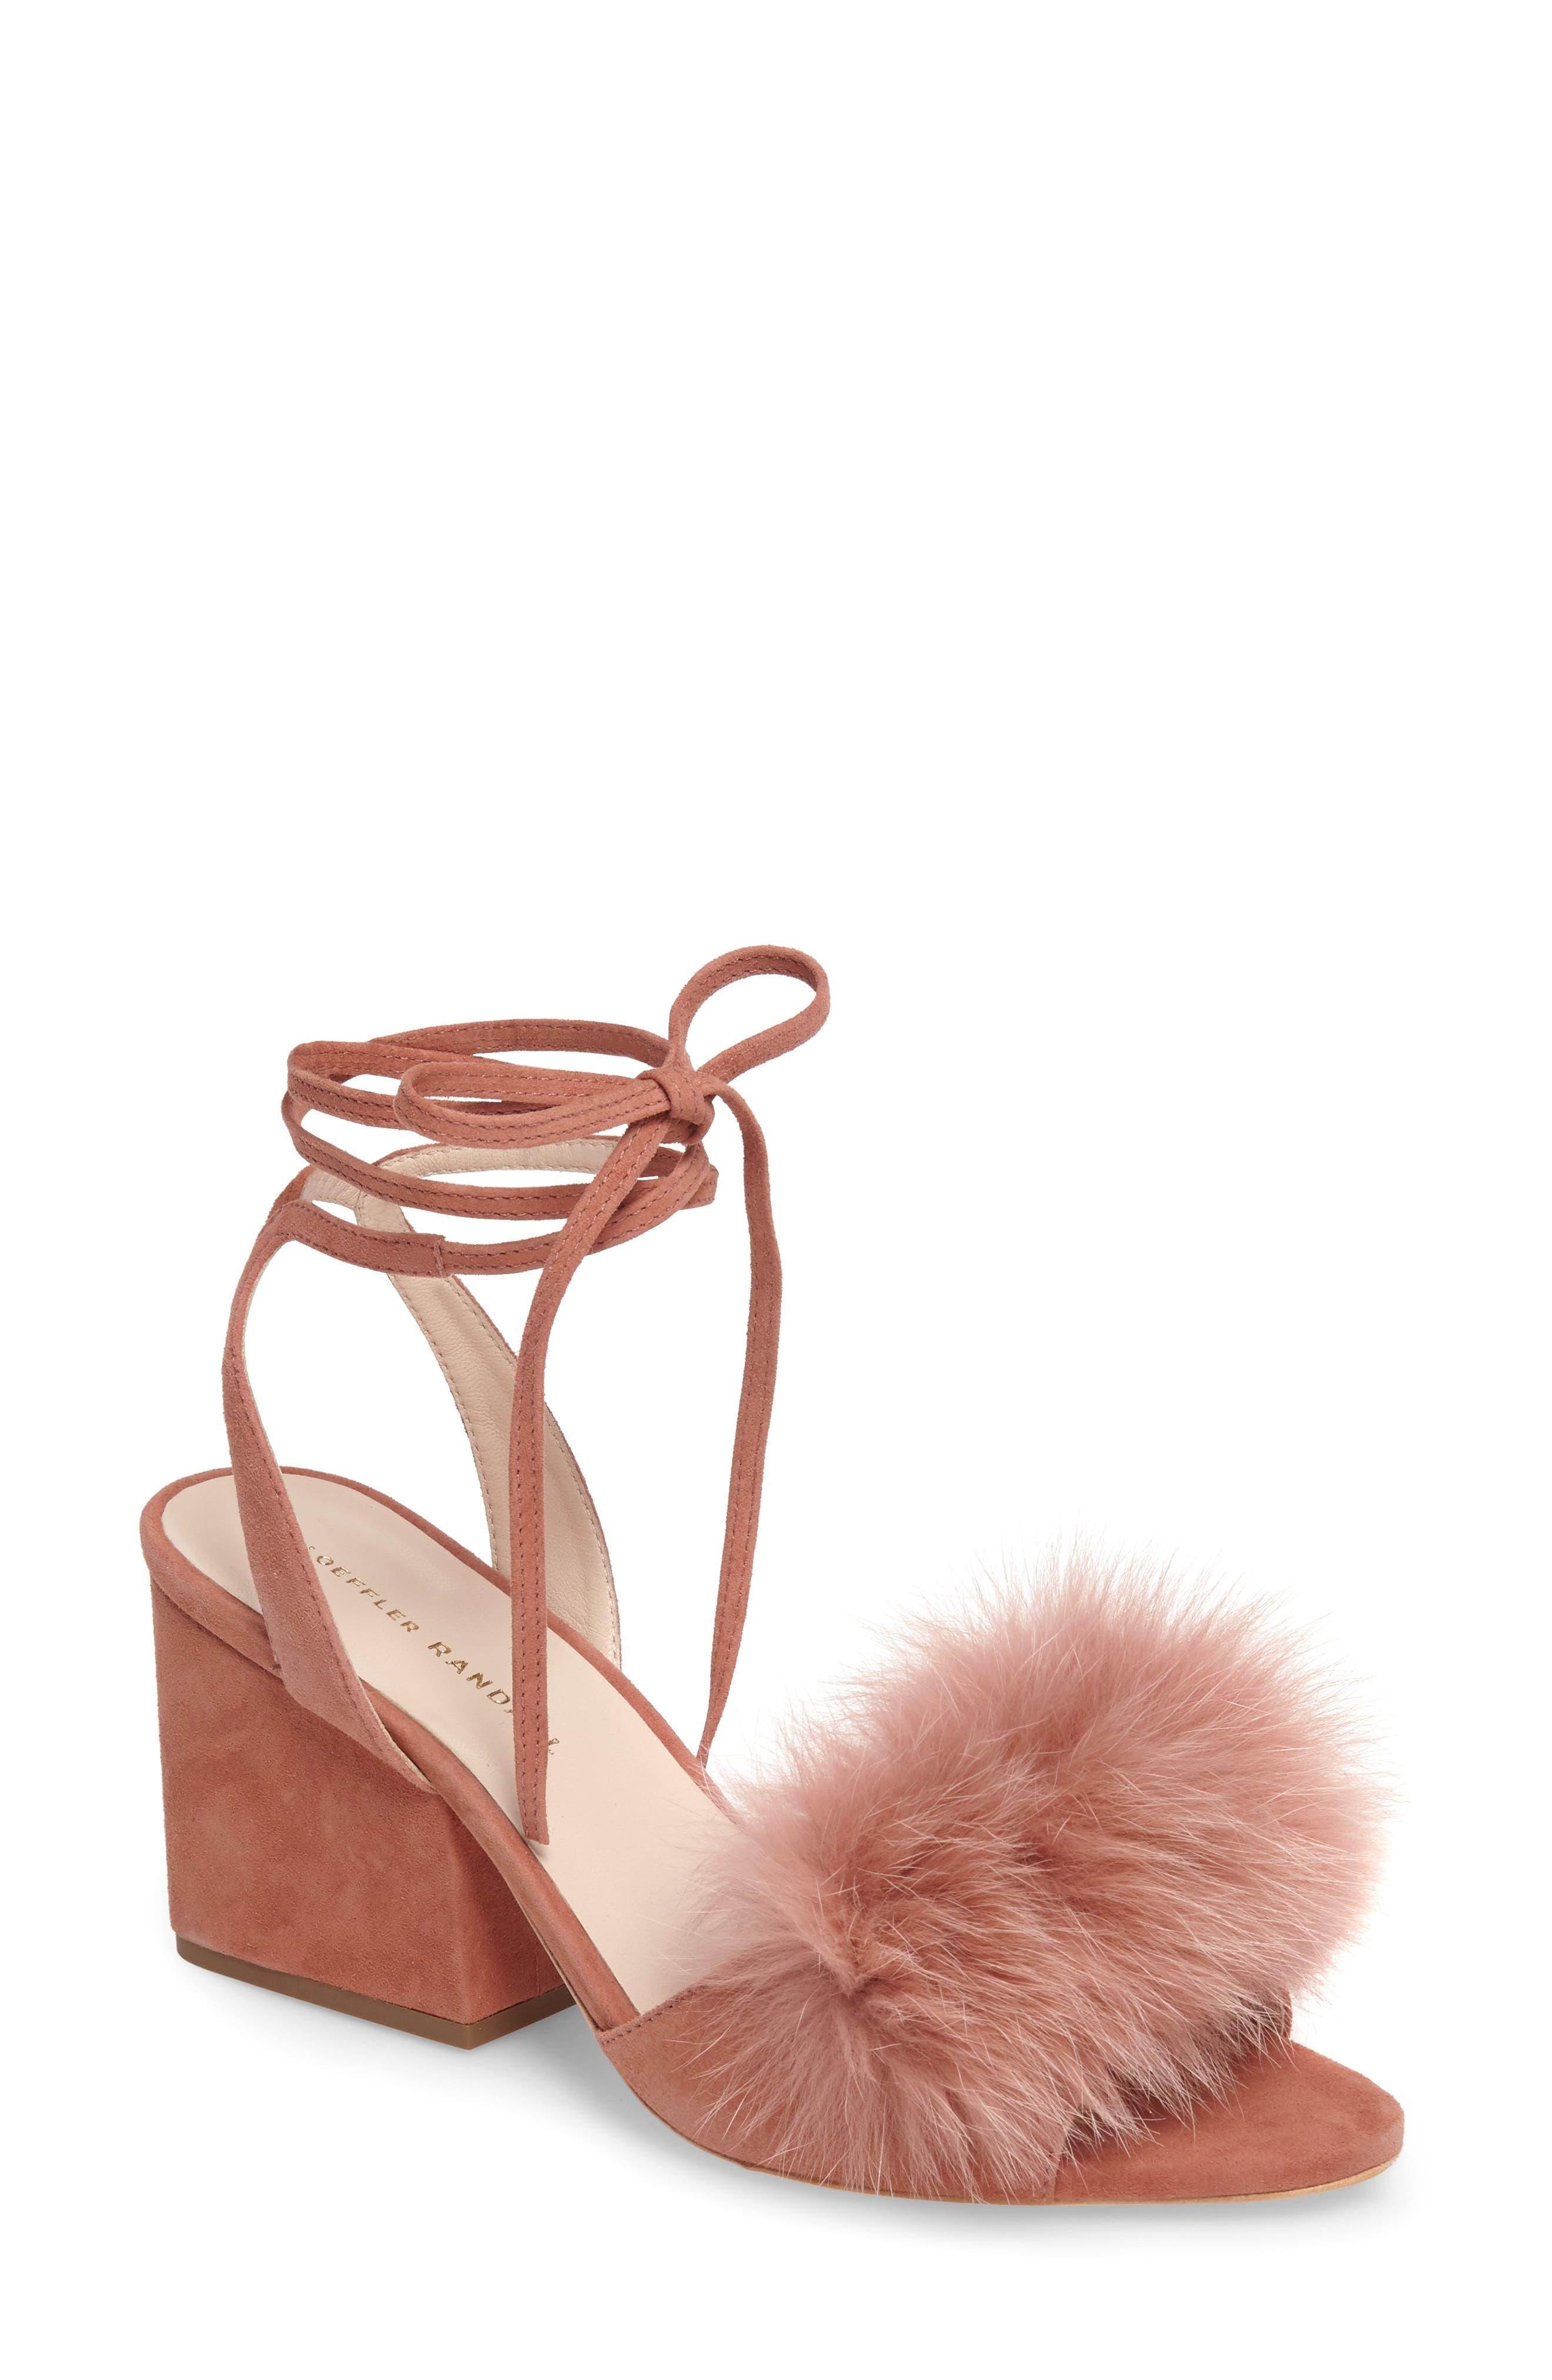 Main Image - Loeffler Randall Nicky Genuine Fox Fur Ankle Wrap Sandal (Women)